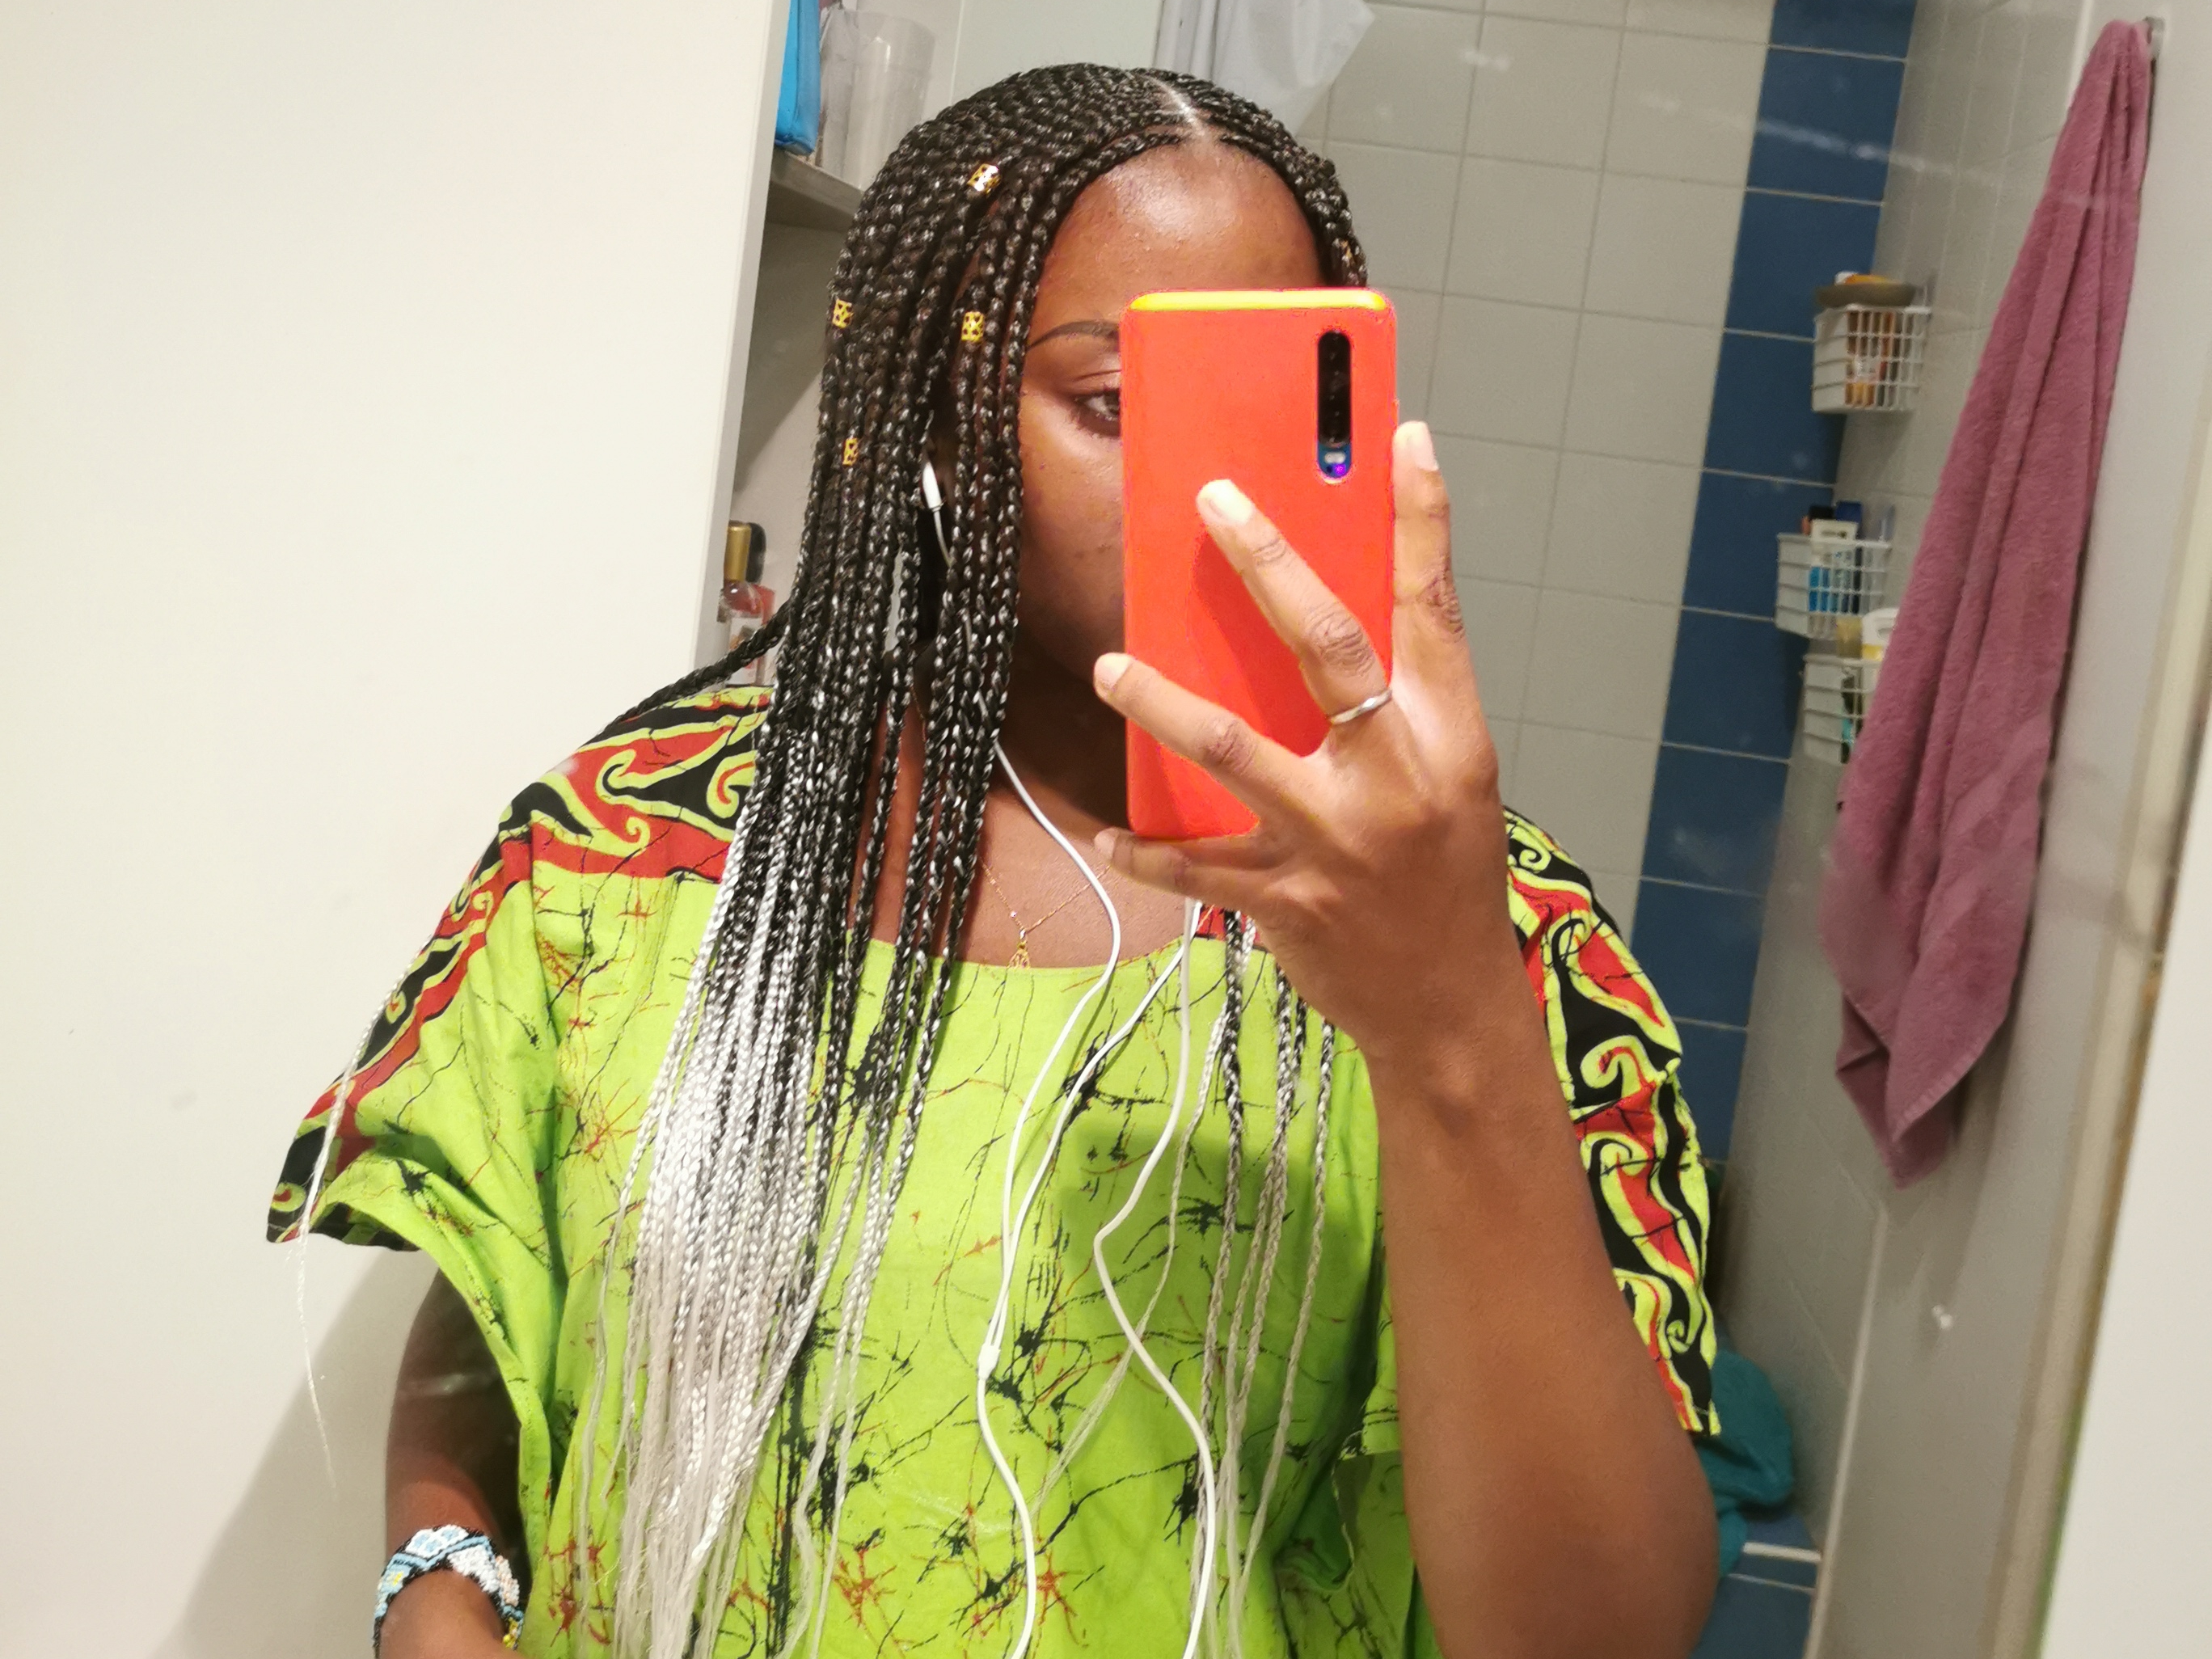 salon de coiffure afro tresse tresses box braids crochet braids vanilles tissages paris 75 77 78 91 92 93 94 95 IYABKBLP